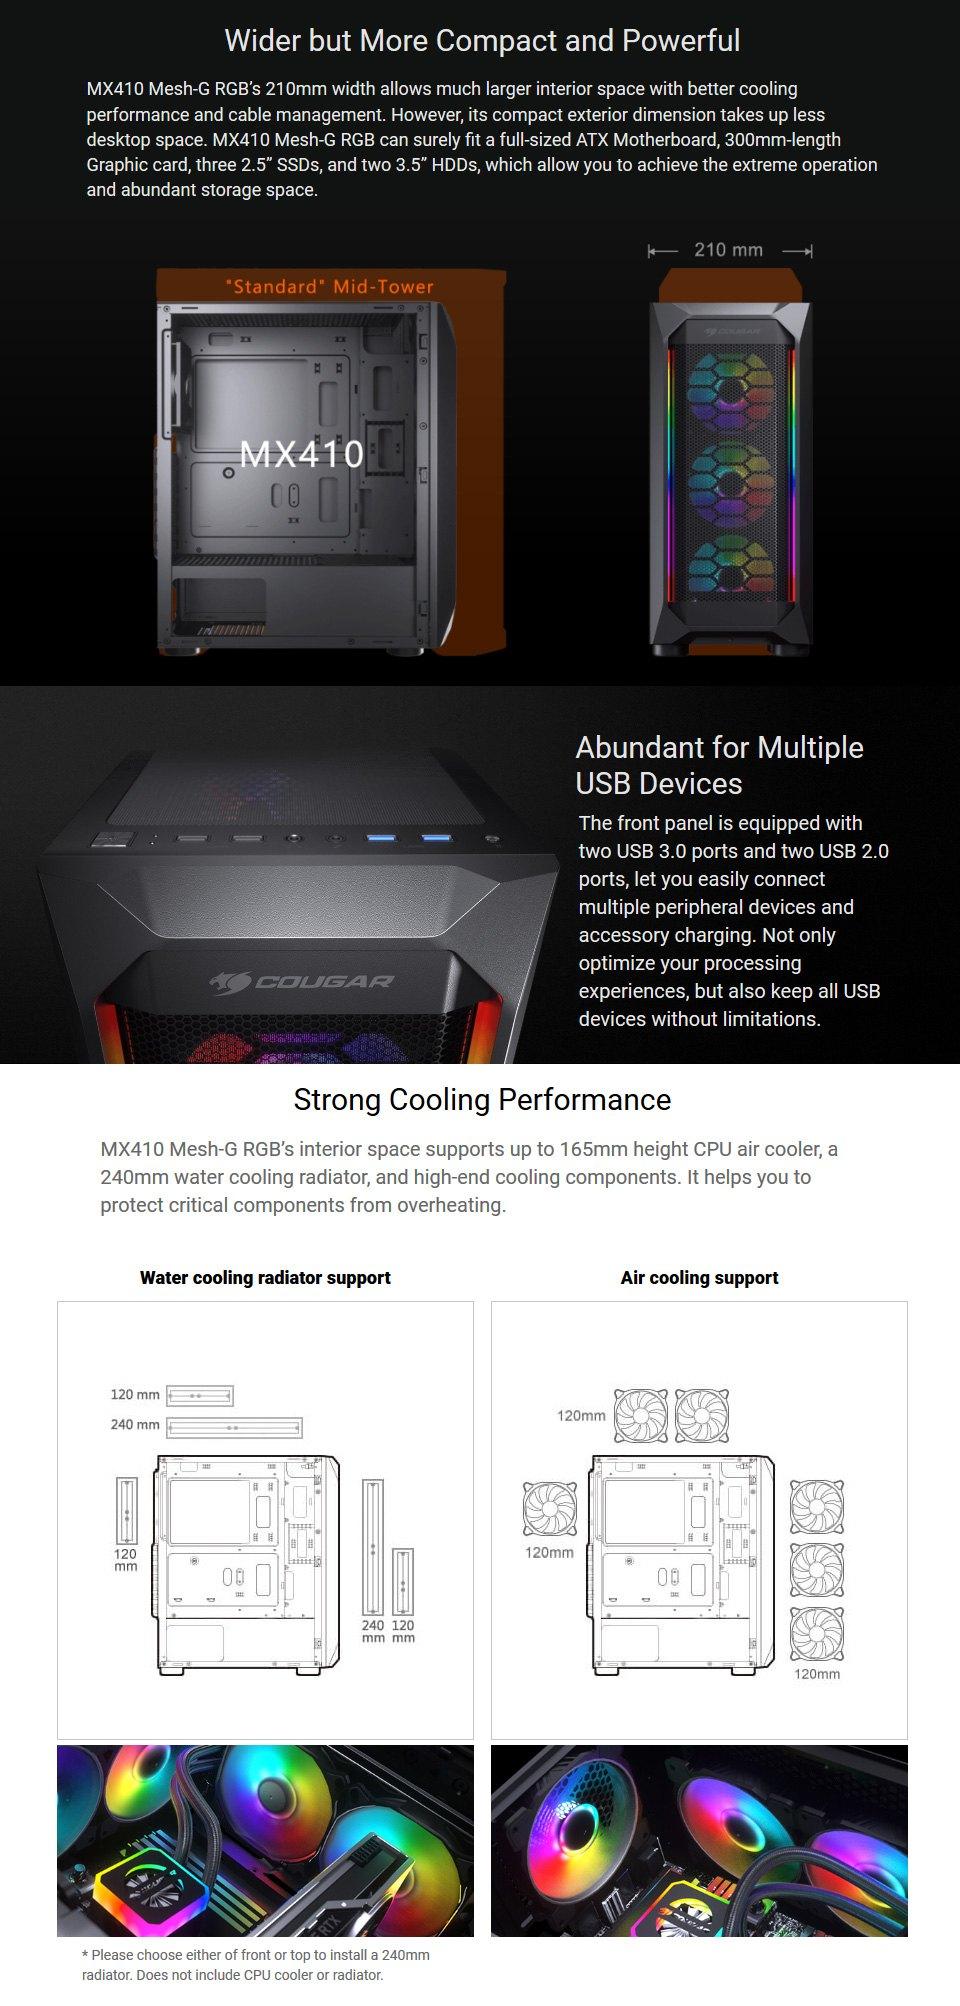 Cougar MX410 Mesh-G RGB Case features 2